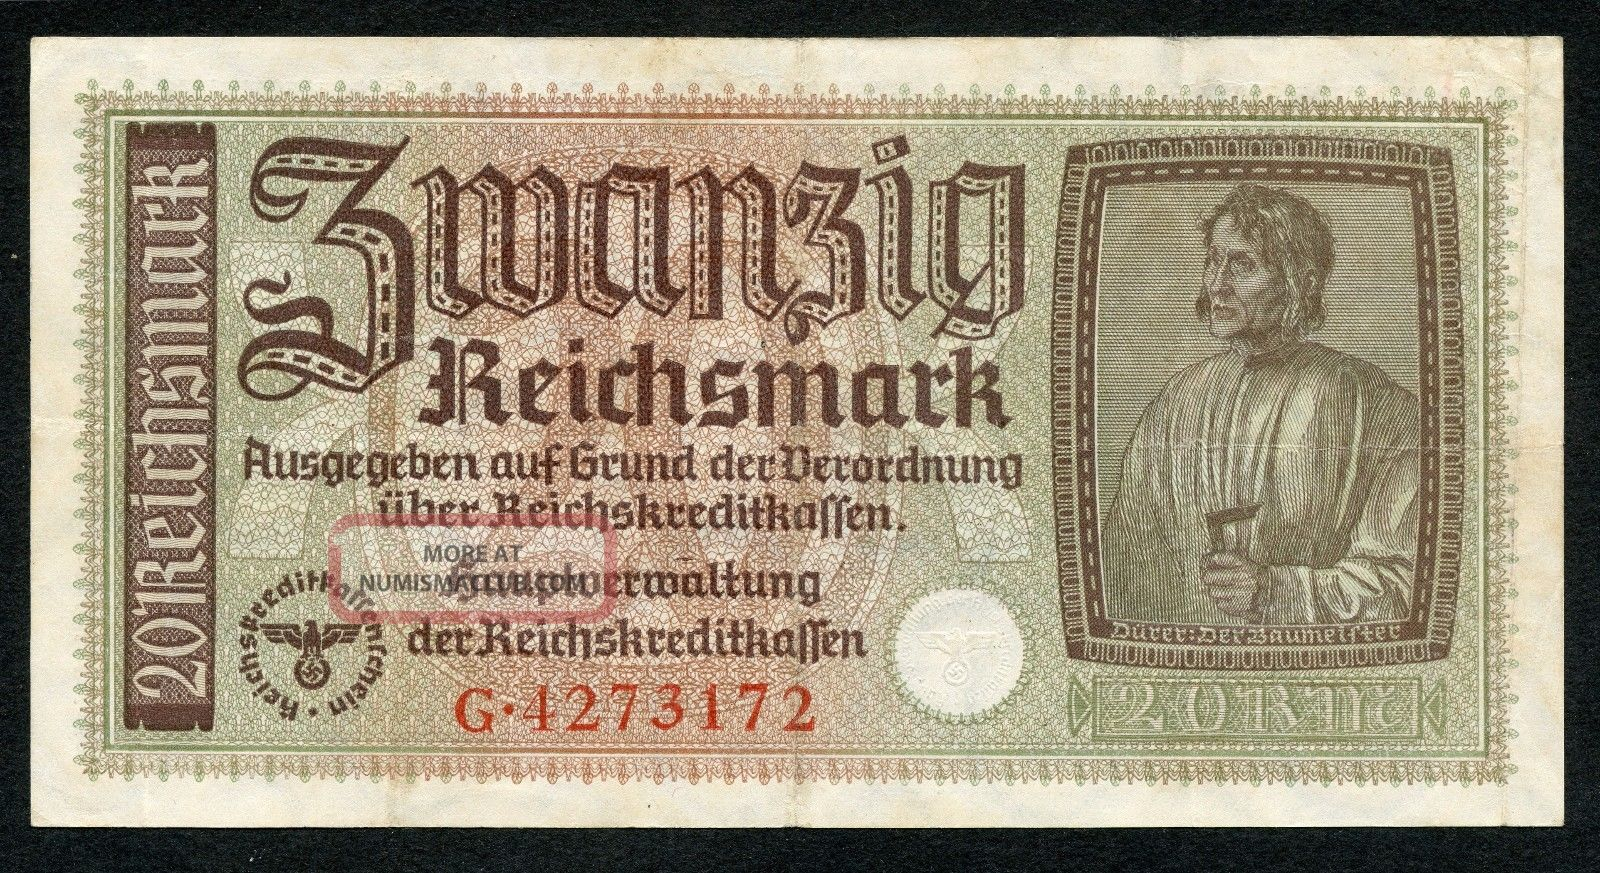 Germany Ww2 20 Reichsmark 1940 - 1945 Series G Vf Europe photo